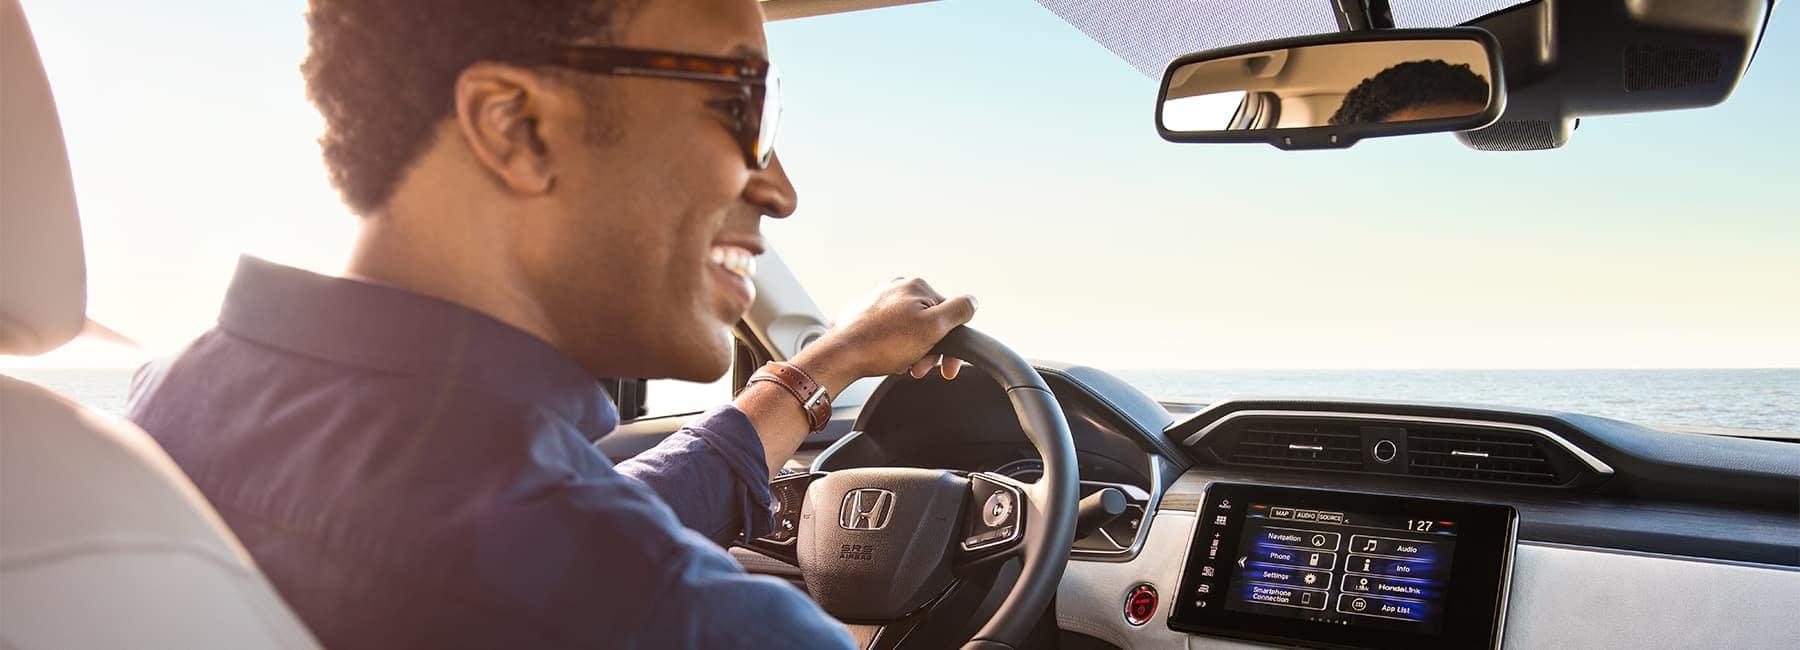 2020-honda-clarity-interior-driver